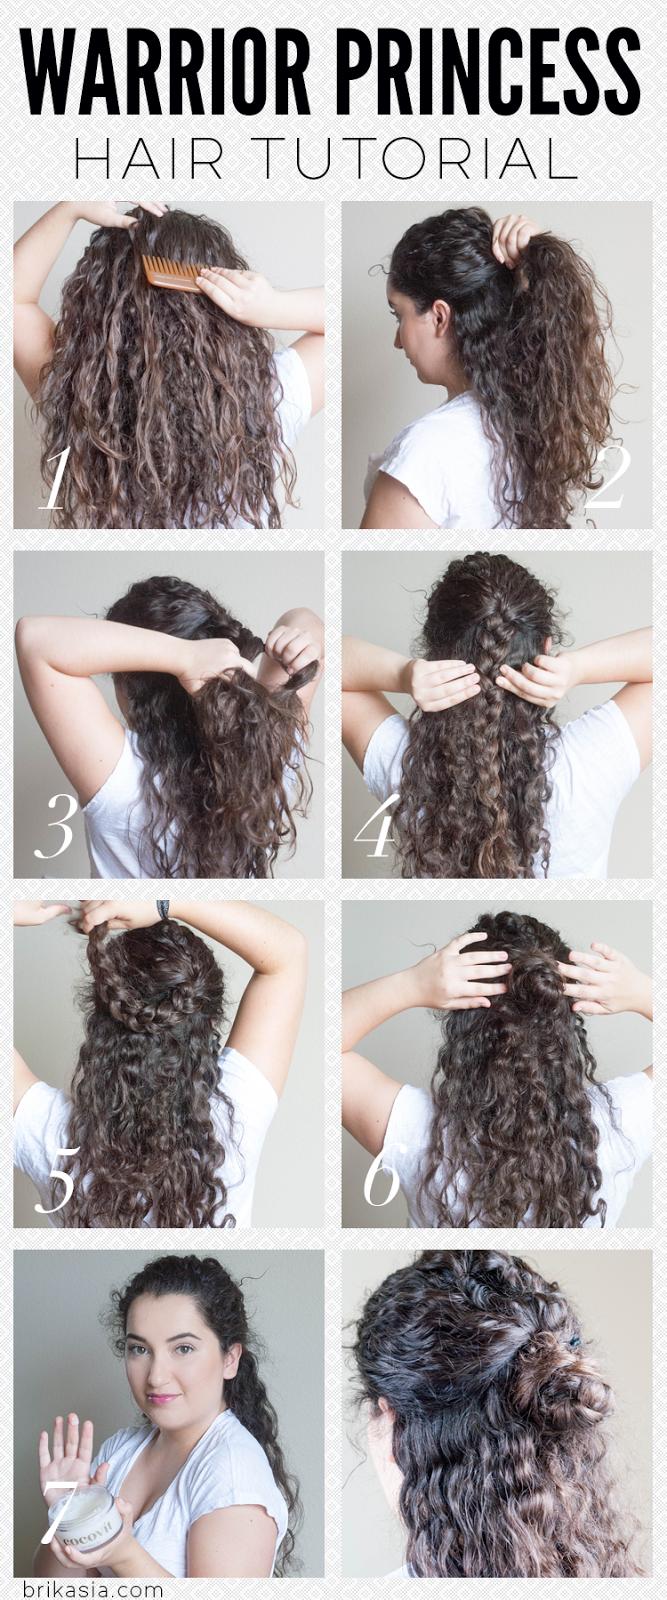 Curly hairstyles tutorials - Warrior Princess Hair Tutorial